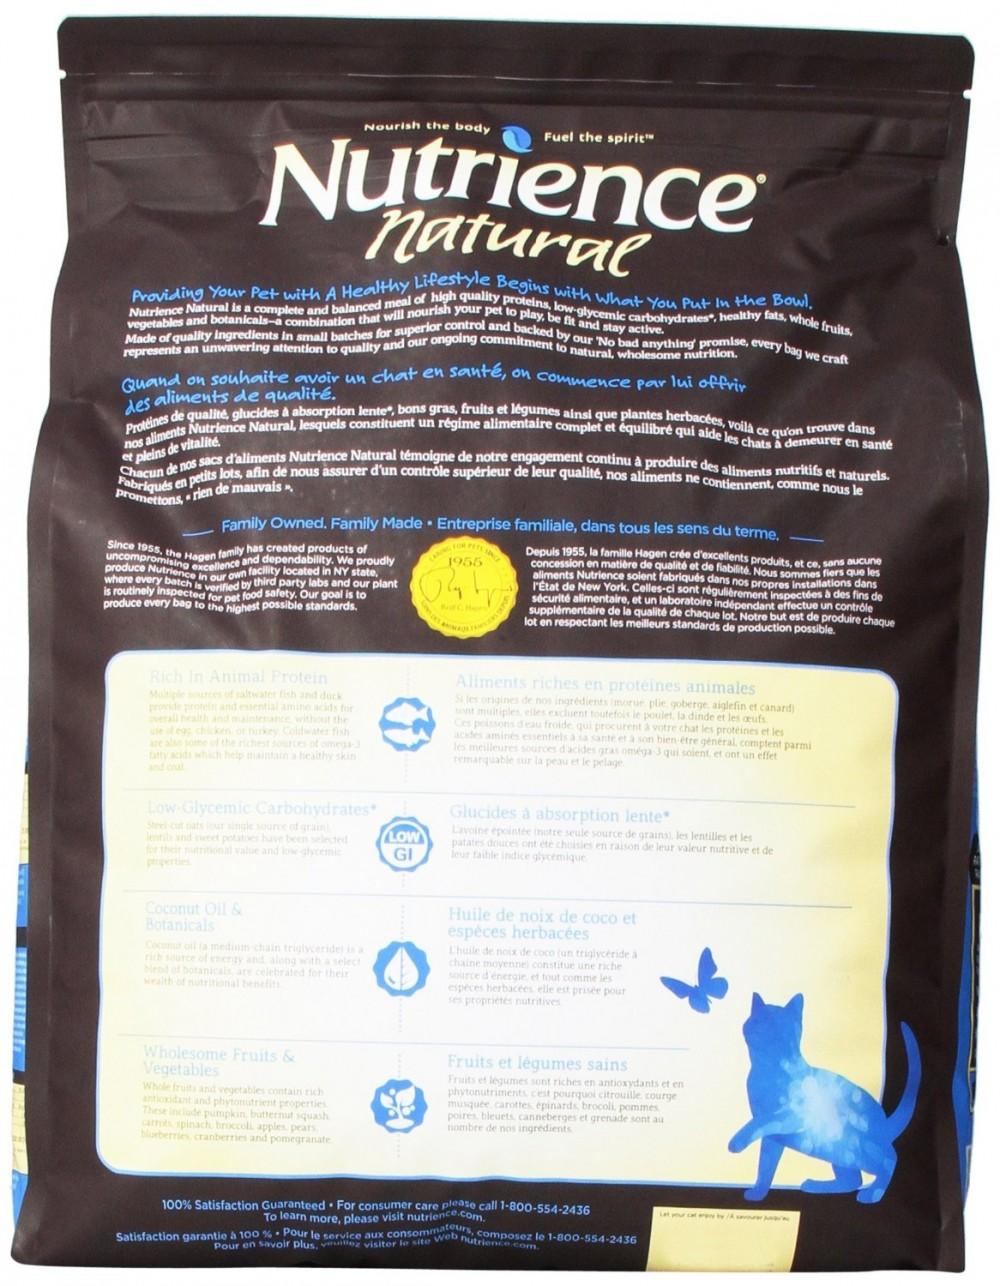 Nutrience Natural bag's back